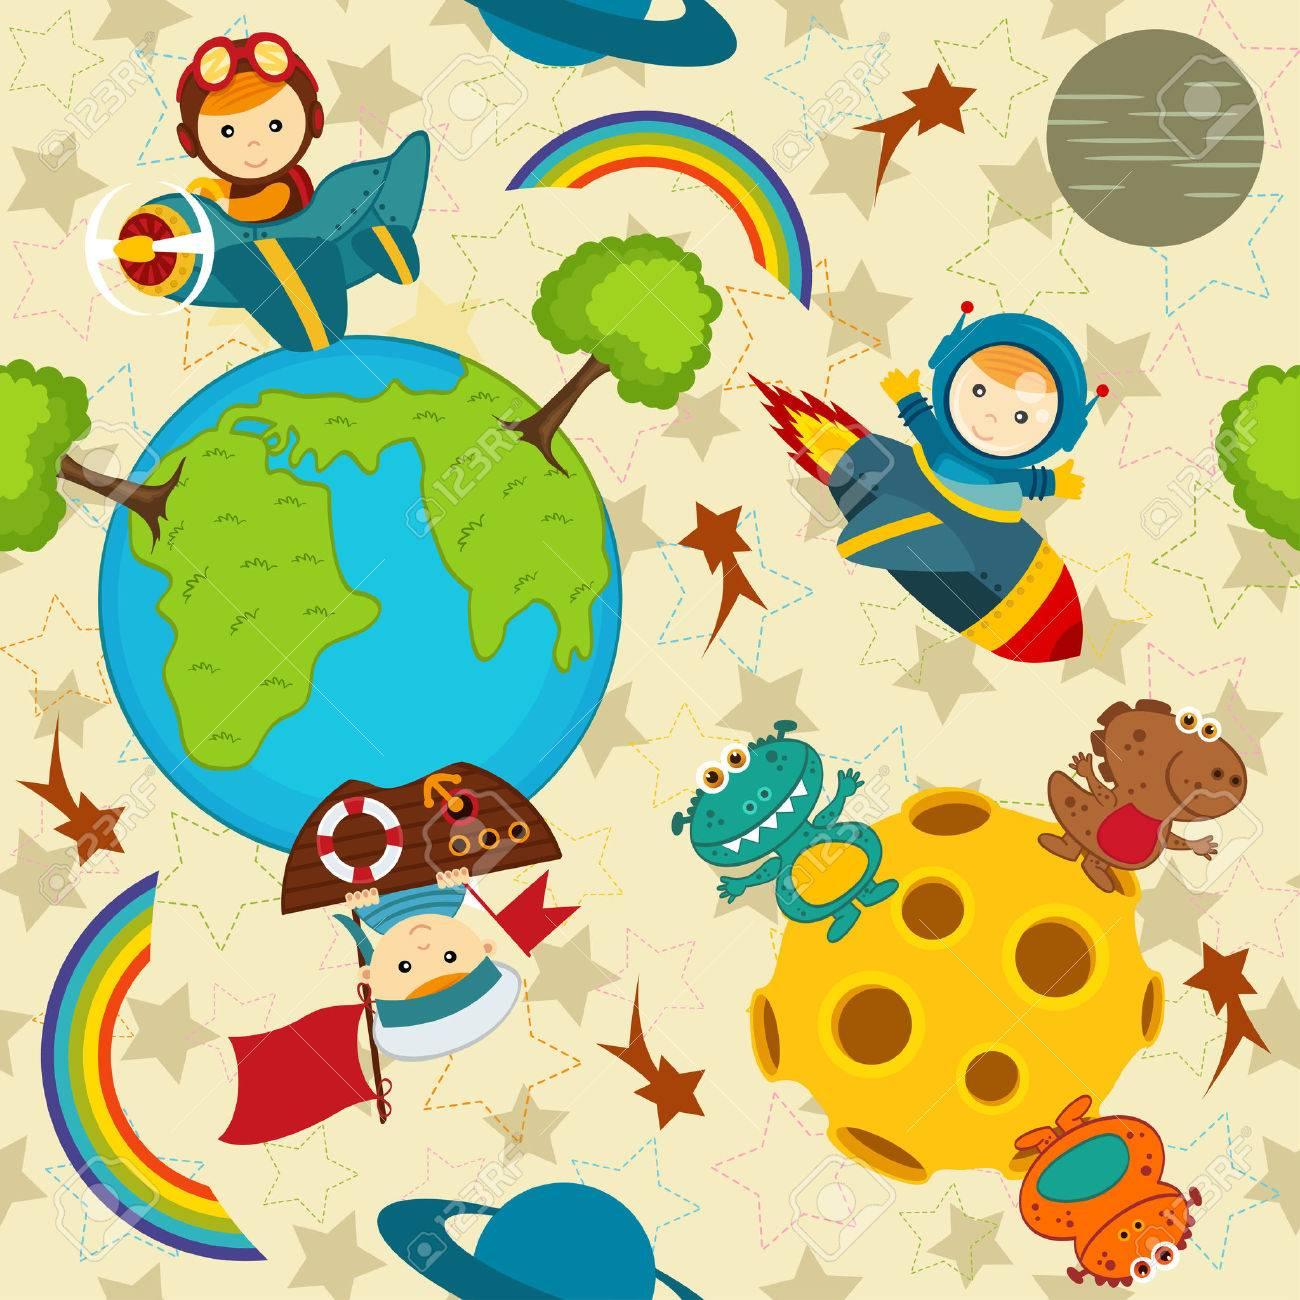 nahtlose Muster Baby im Raum Vektor-Illustration eps Standard-Bild - 41819983